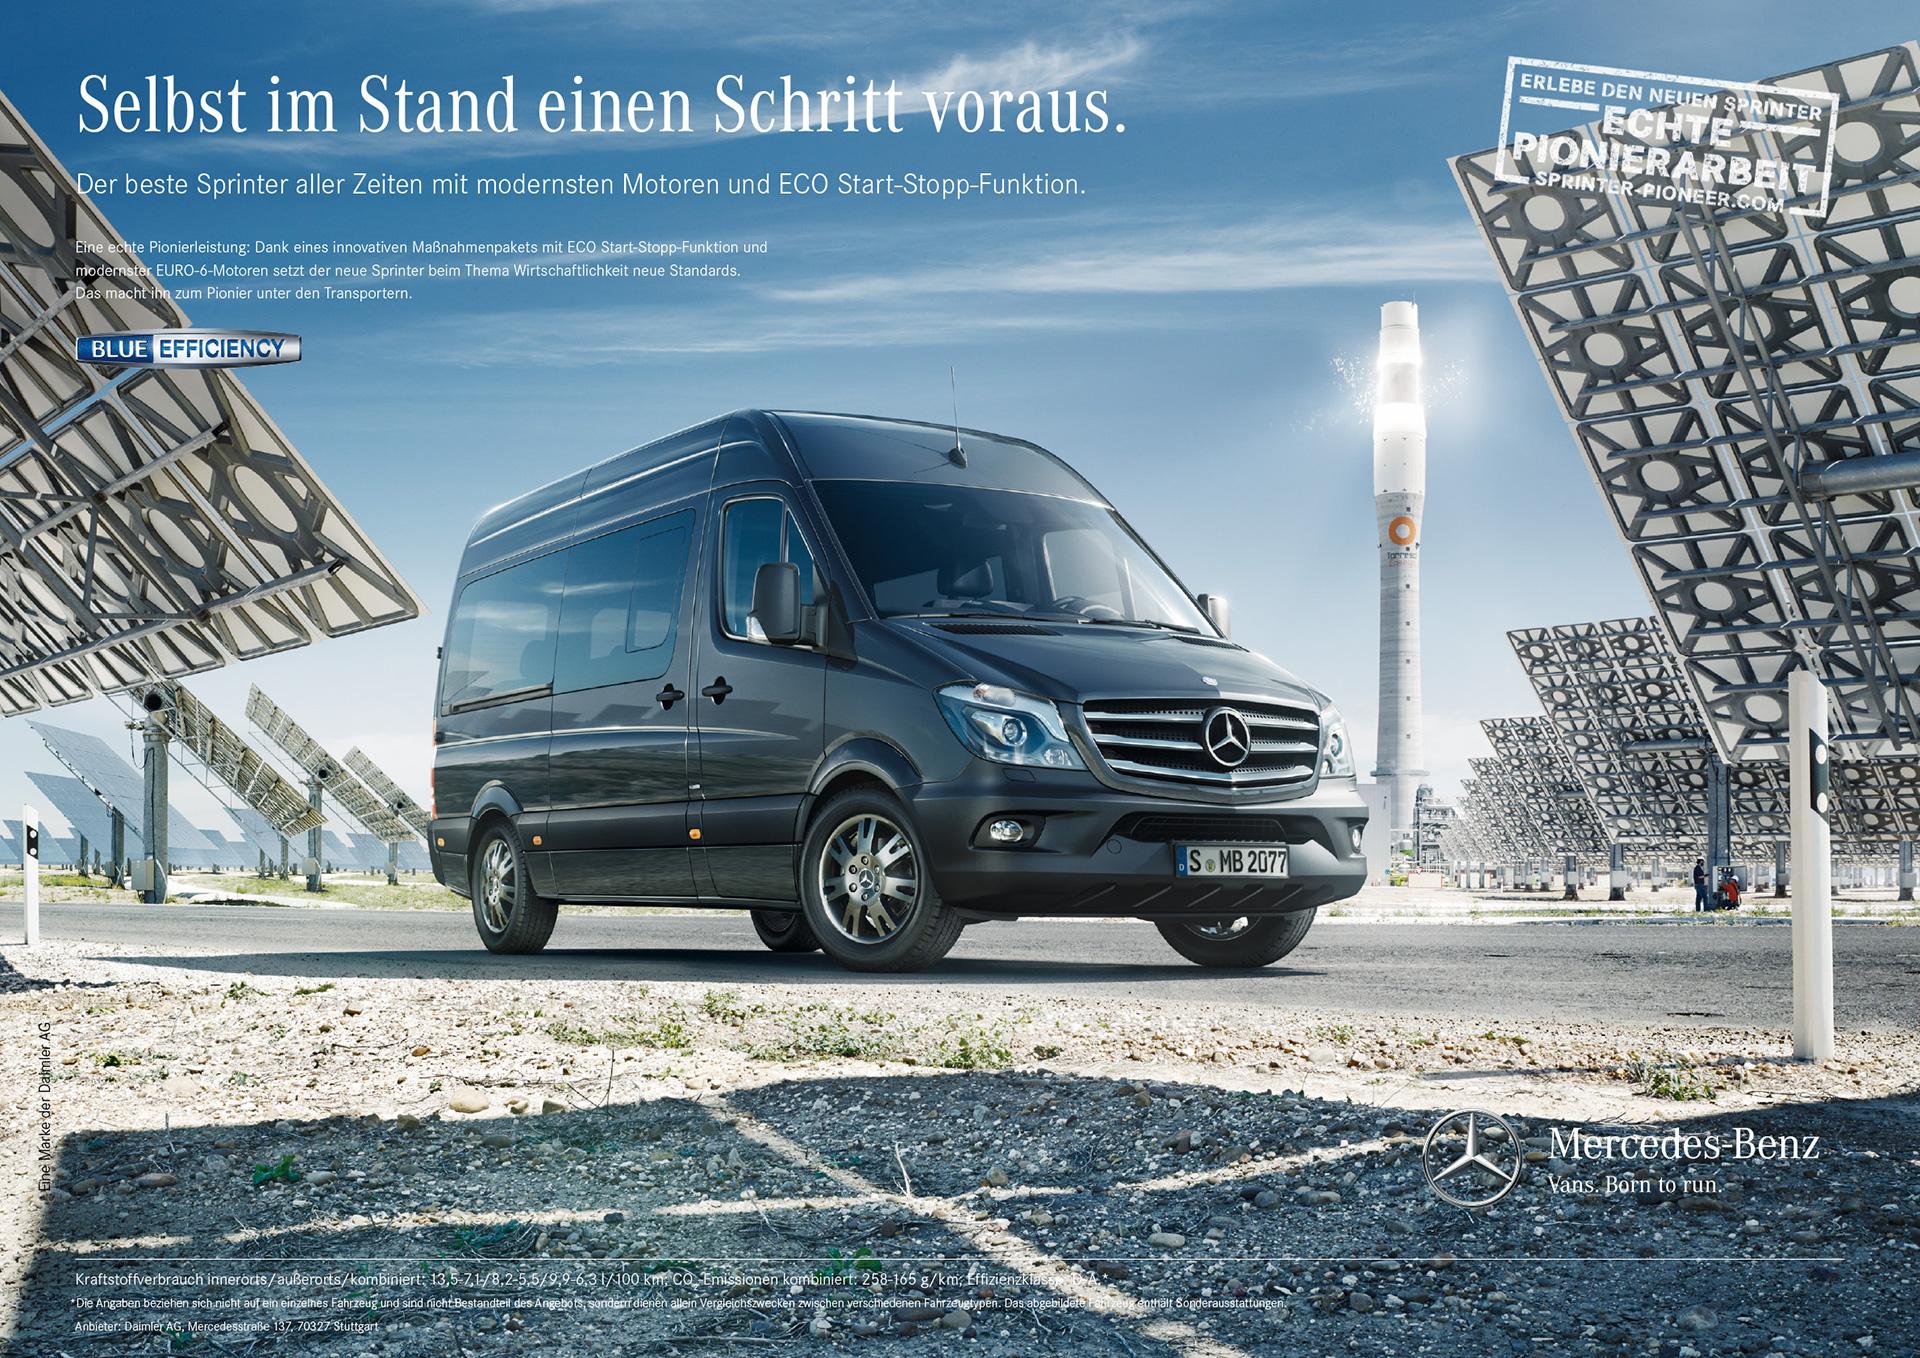 Kerstin_Correll_Mercedes-Benz_Sprinter_Pioneer_02